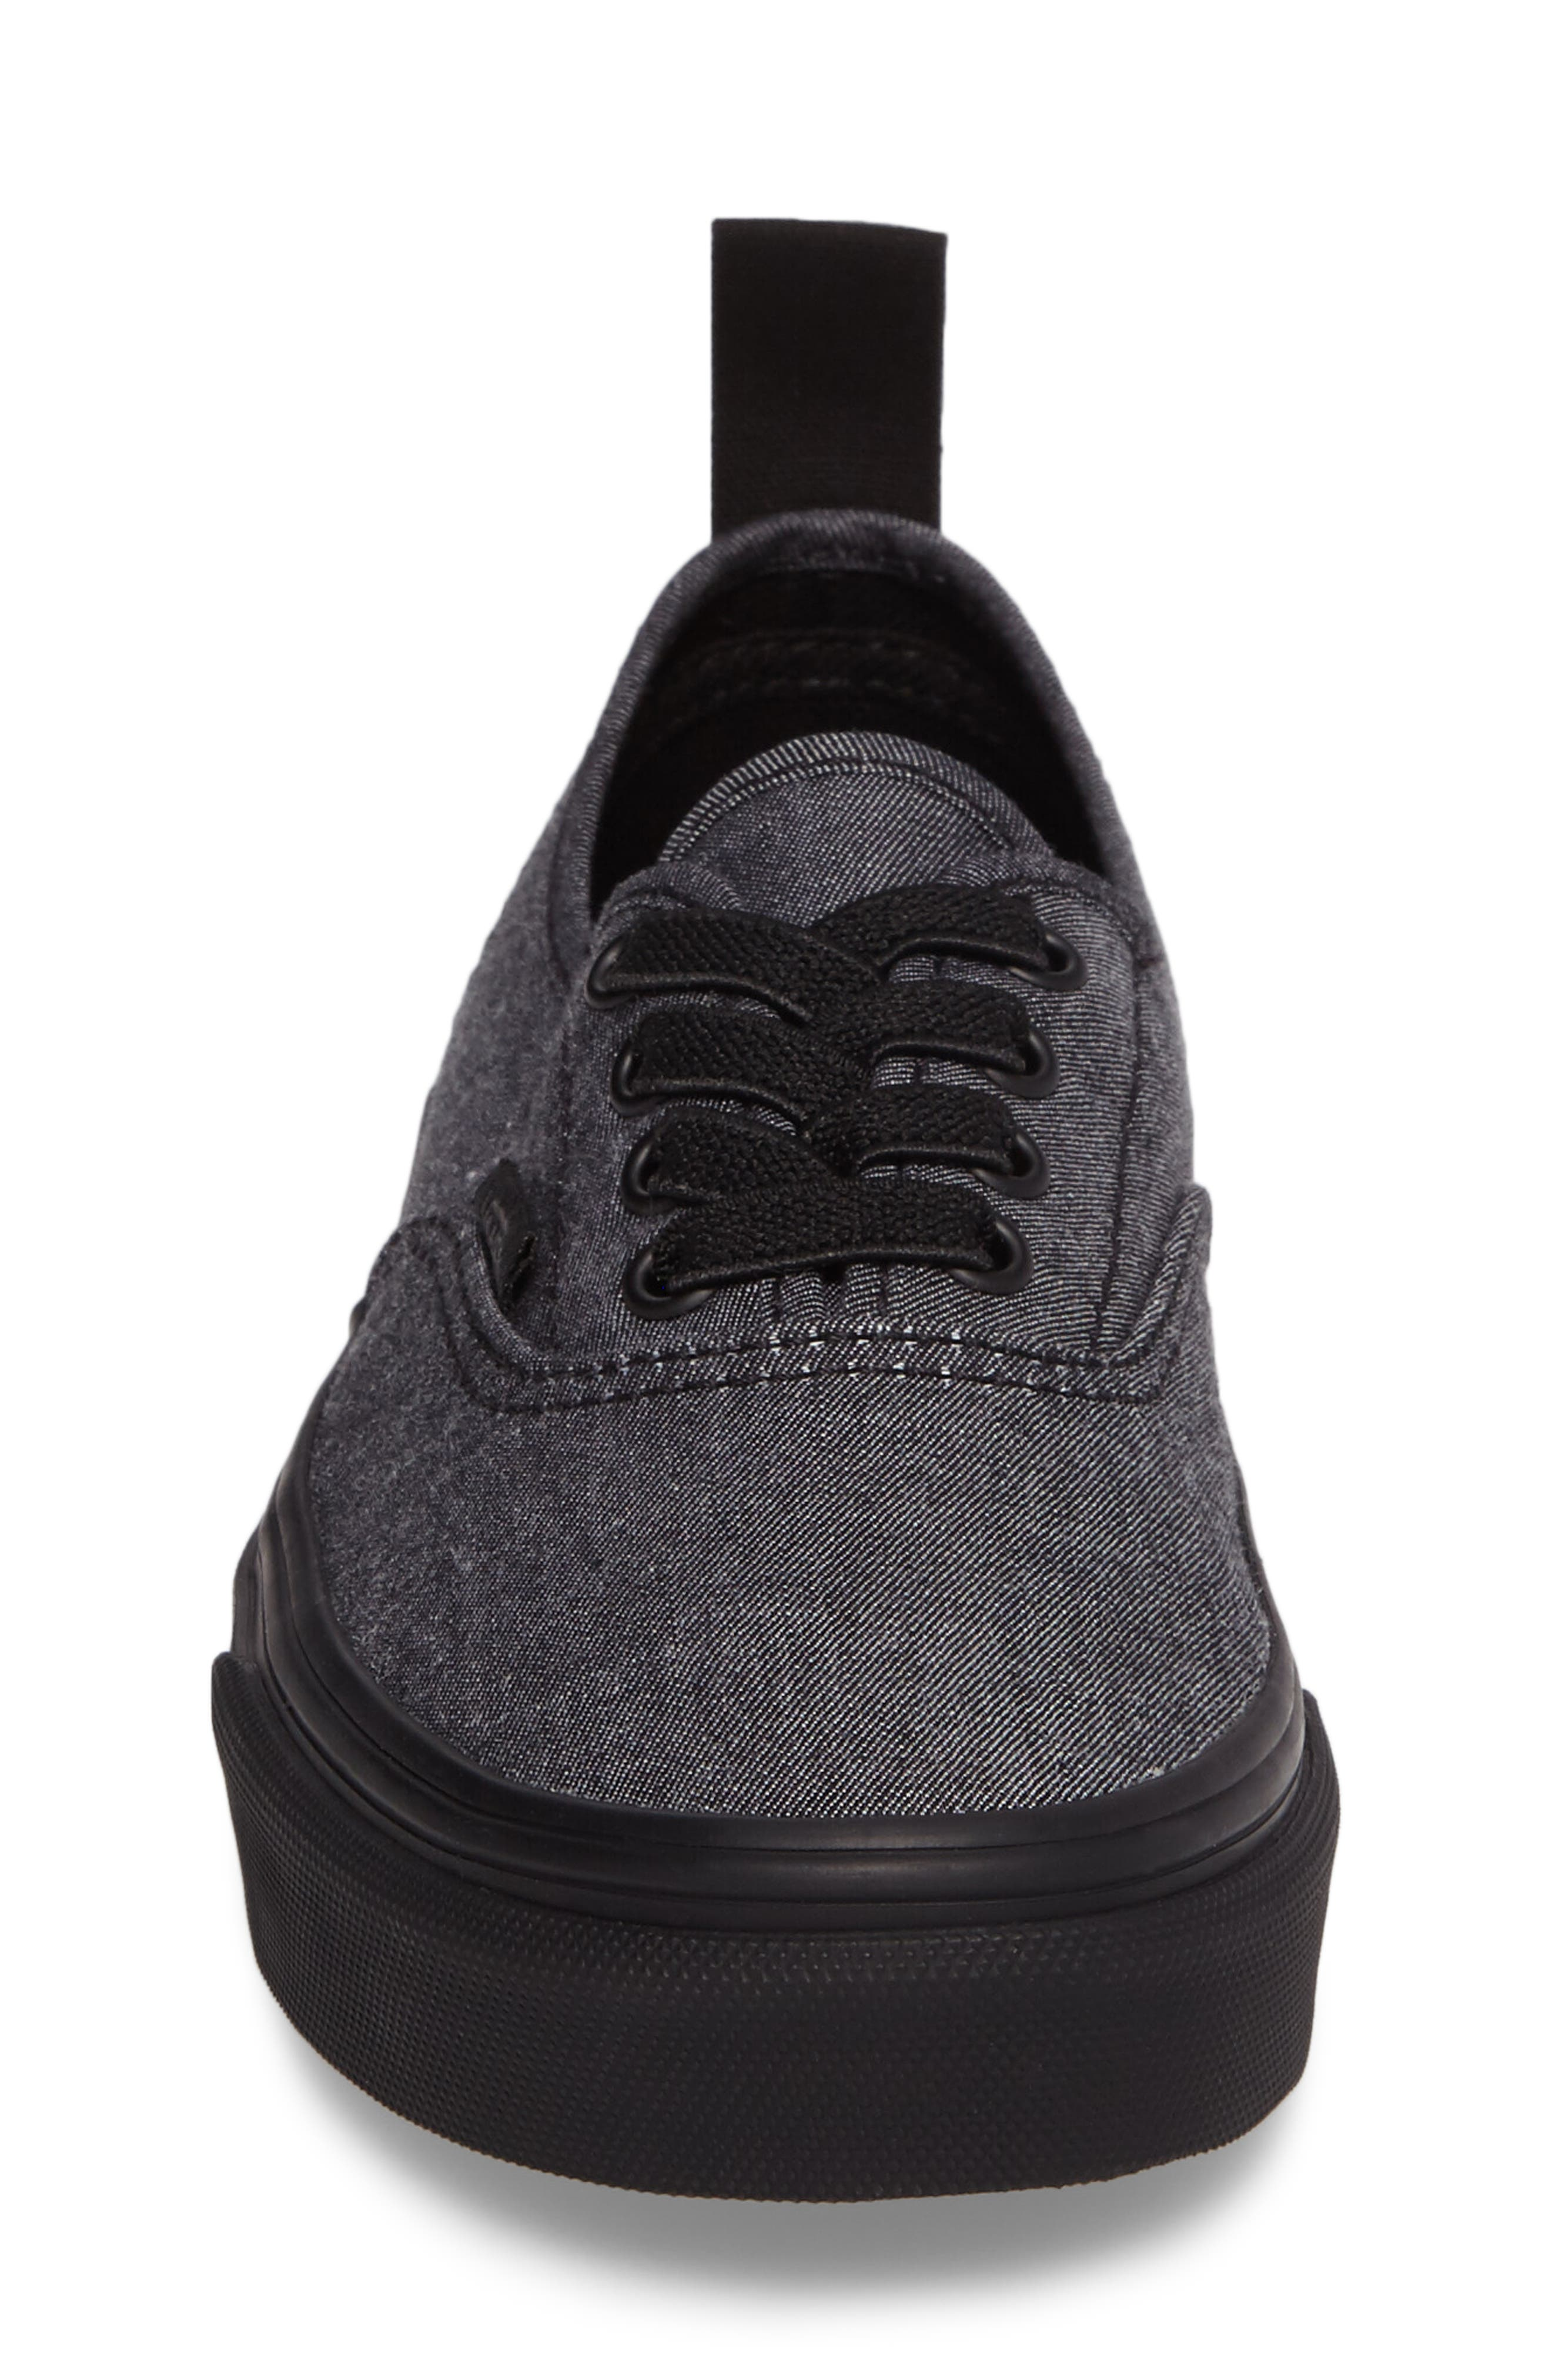 Alternate Image 4  - Vans Authentic Elastic Sneaker (Toddler, Little Kid & Big Kid)